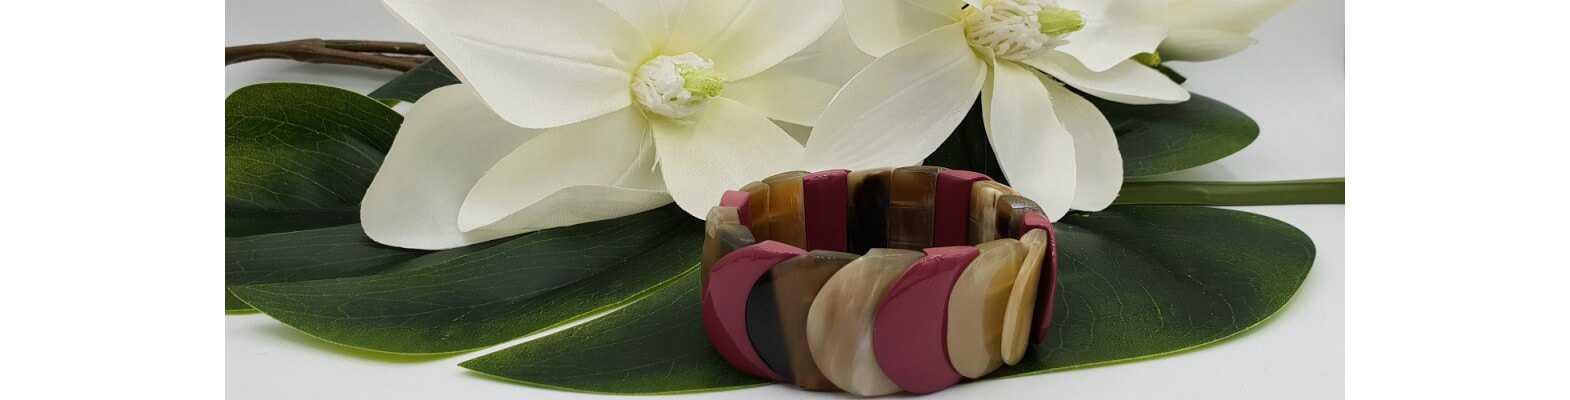 Armbänder mit Büffelhorn